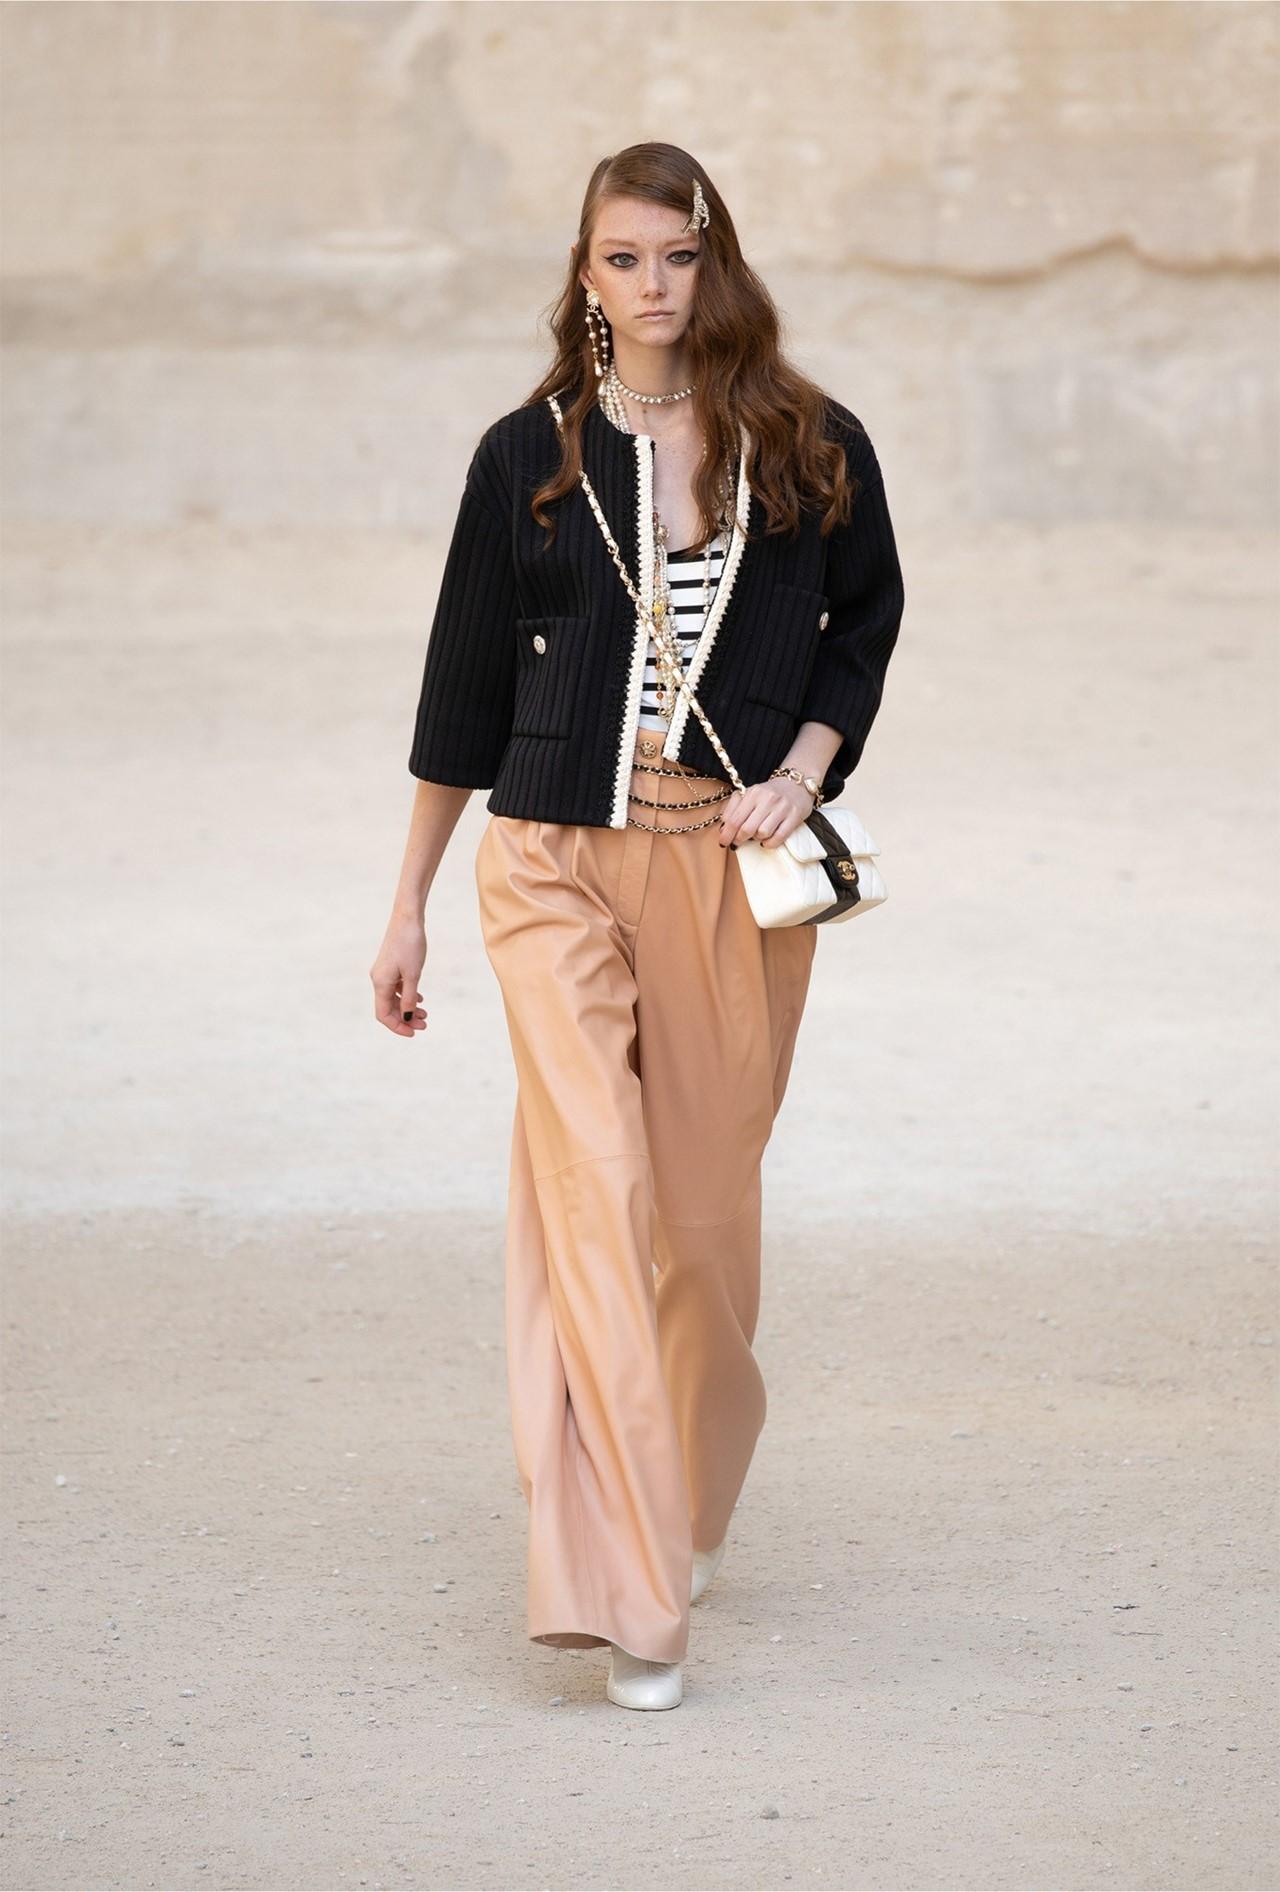 Chanel_Cruise_2022_Fashionela (47)